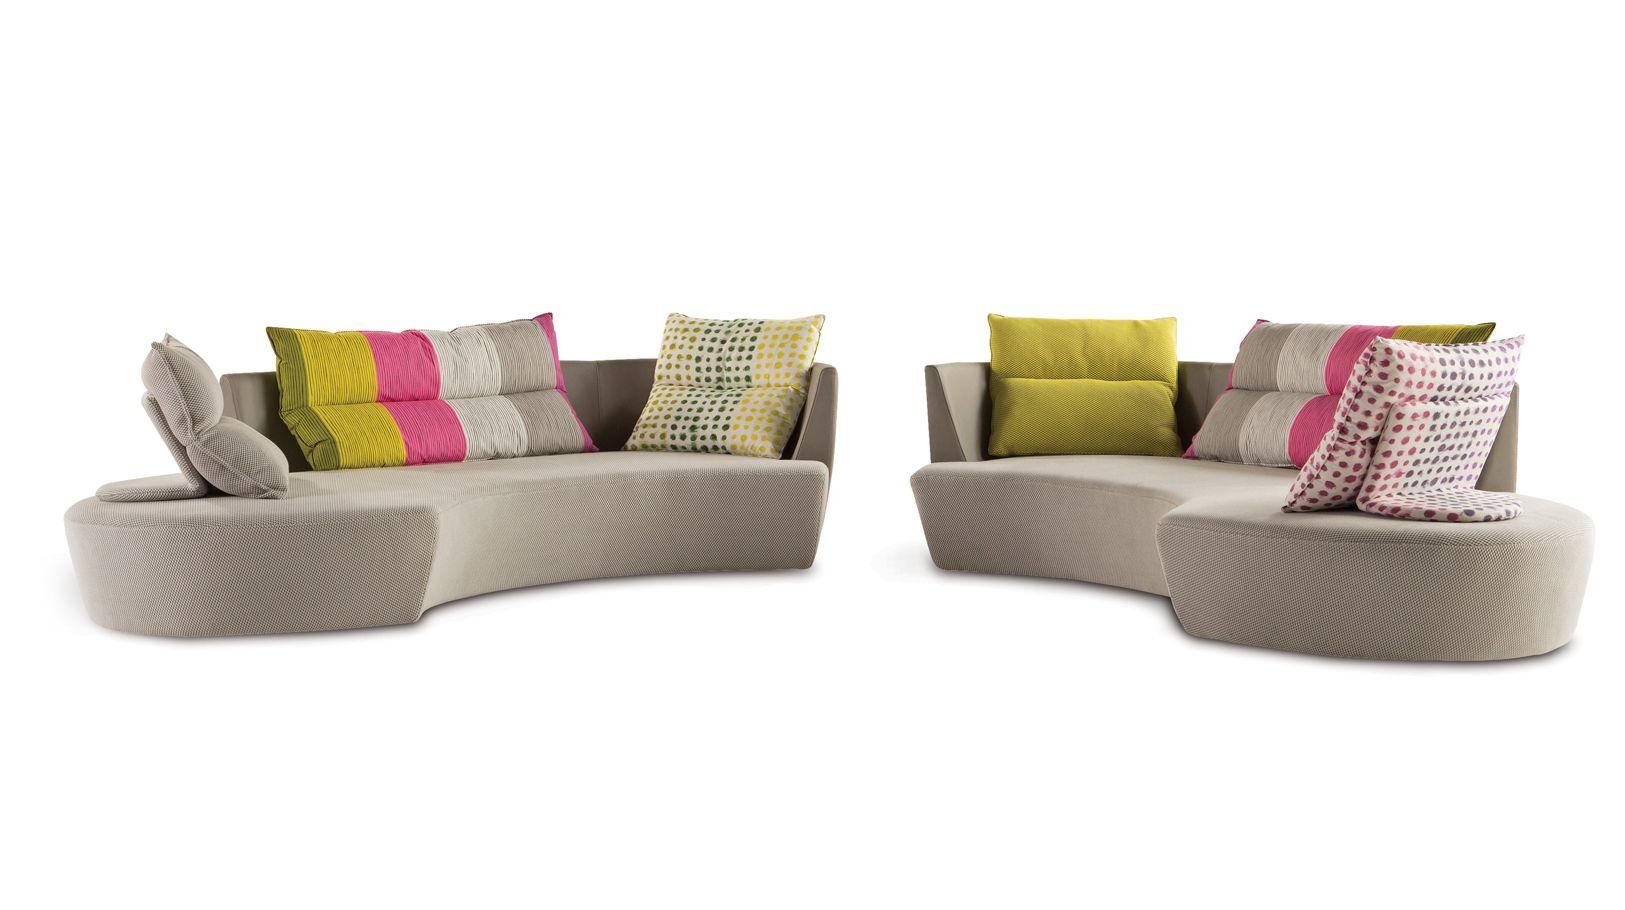 equinox rug roche bobois. Black Bedroom Furniture Sets. Home Design Ideas